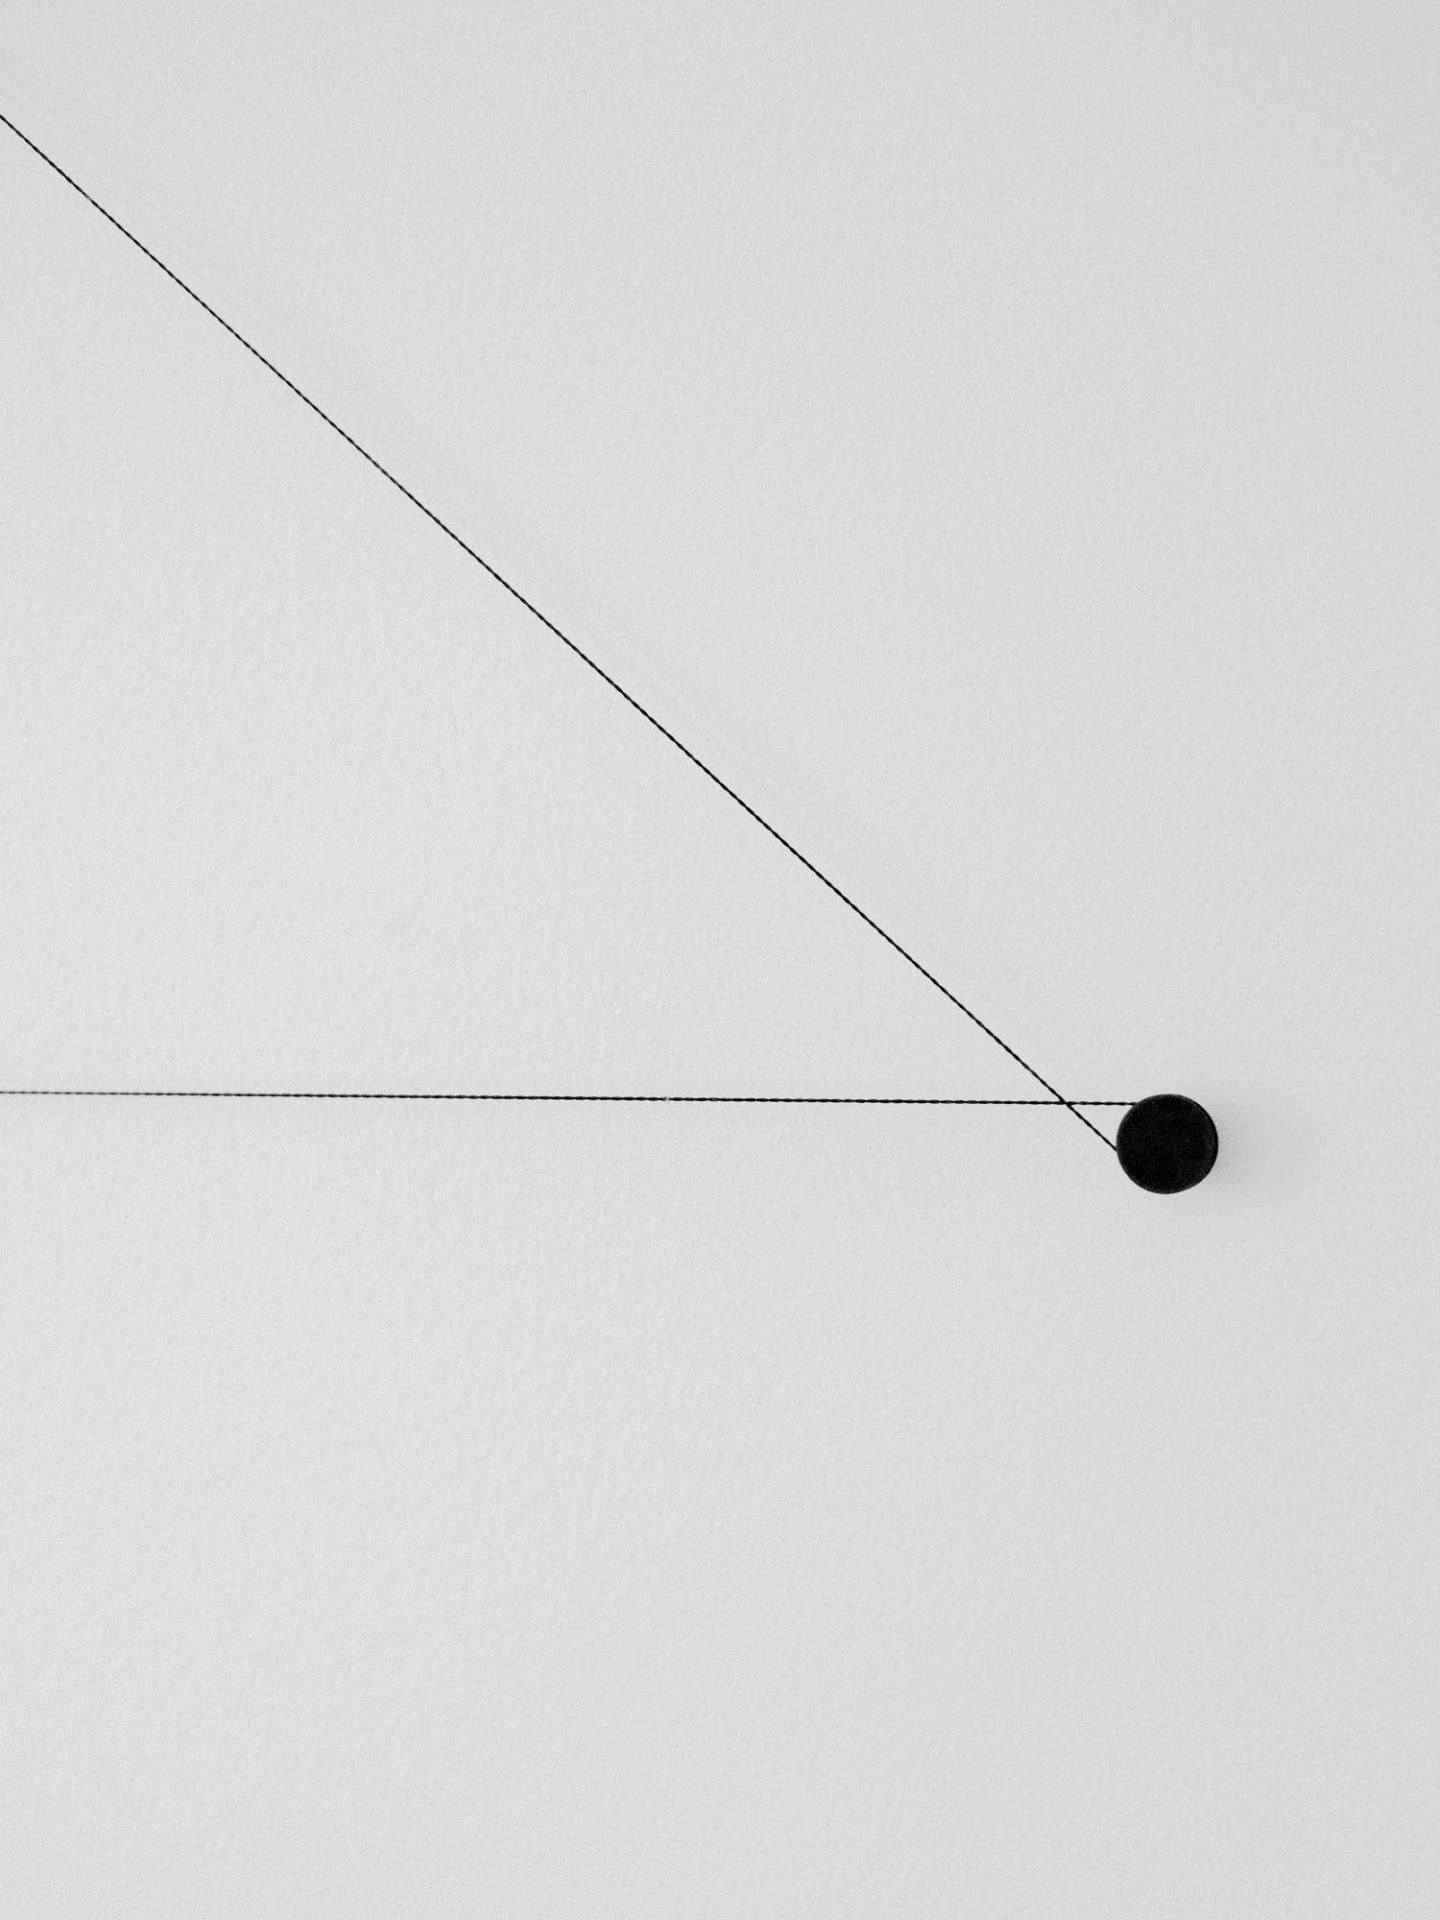 ignant-samsung-jonas-bjerre-poulsen-0607